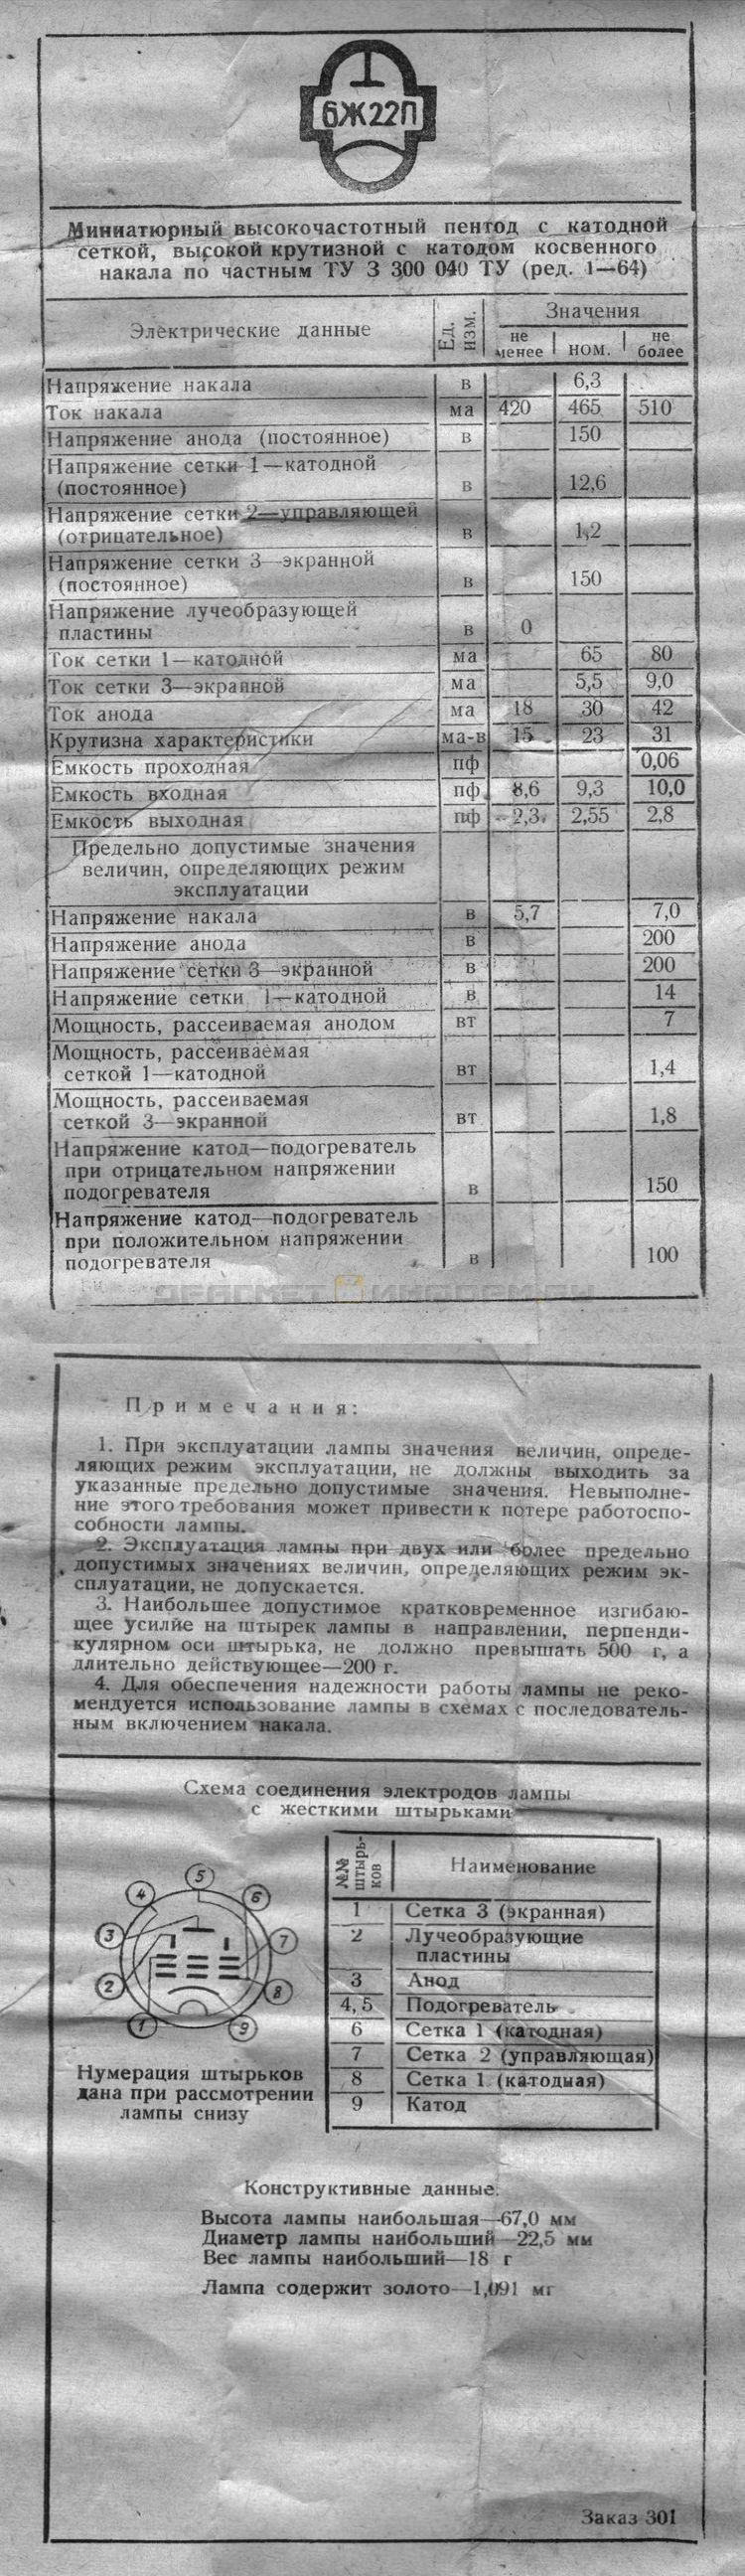 Формуляр 6Ж22П